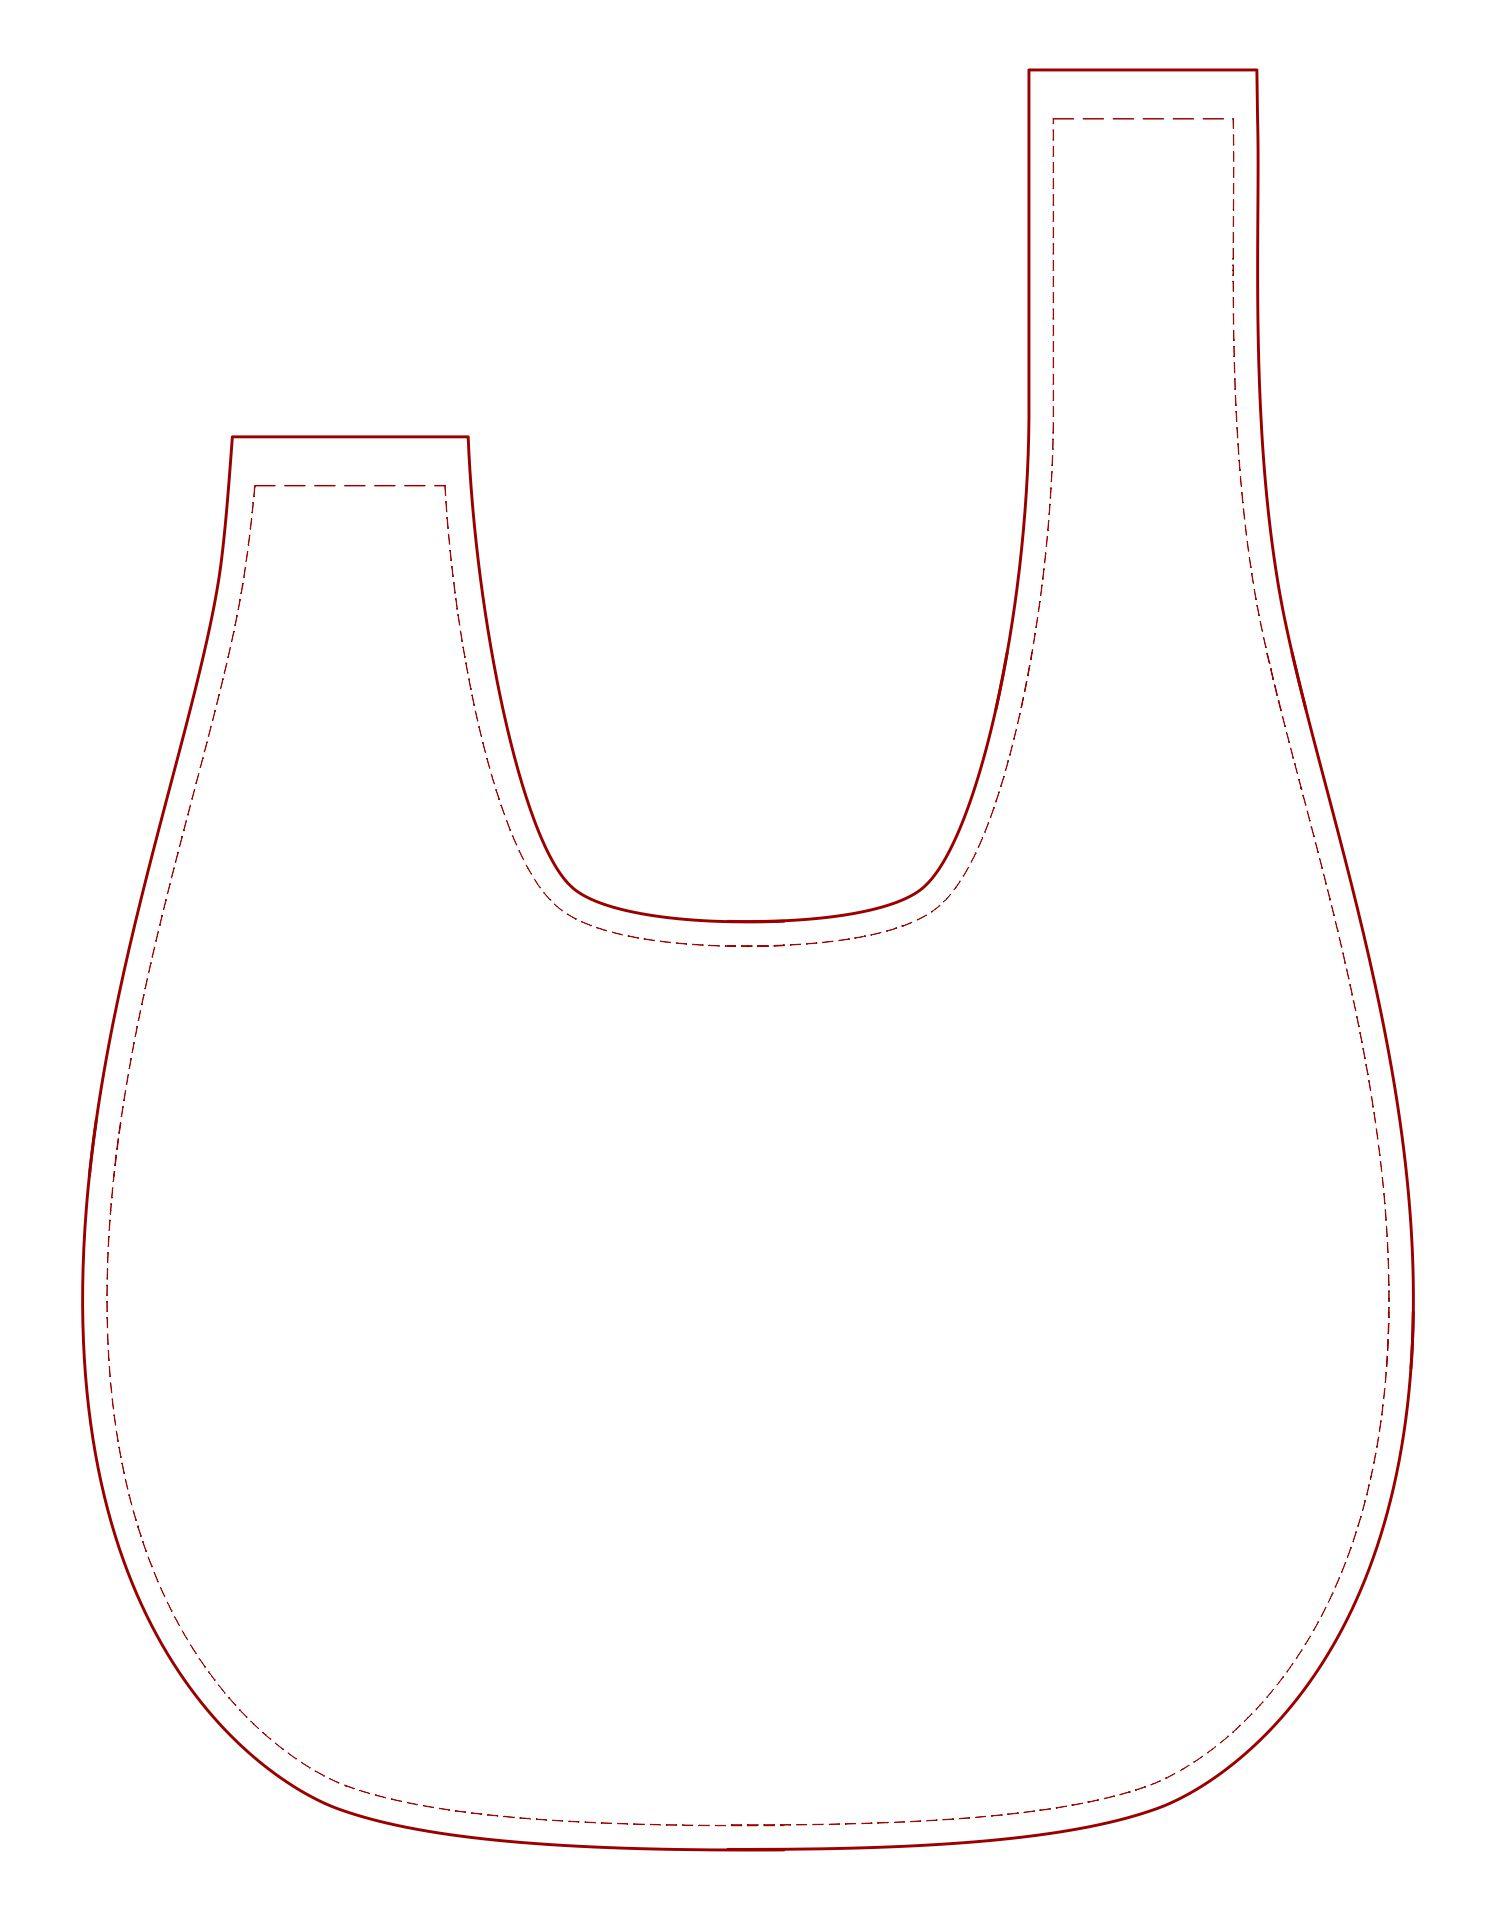 Knot Bag Knitting Pattern : 7 Best Images of Japanese Knot Bag Free Printable Pattern - Japanese Knot Bag...